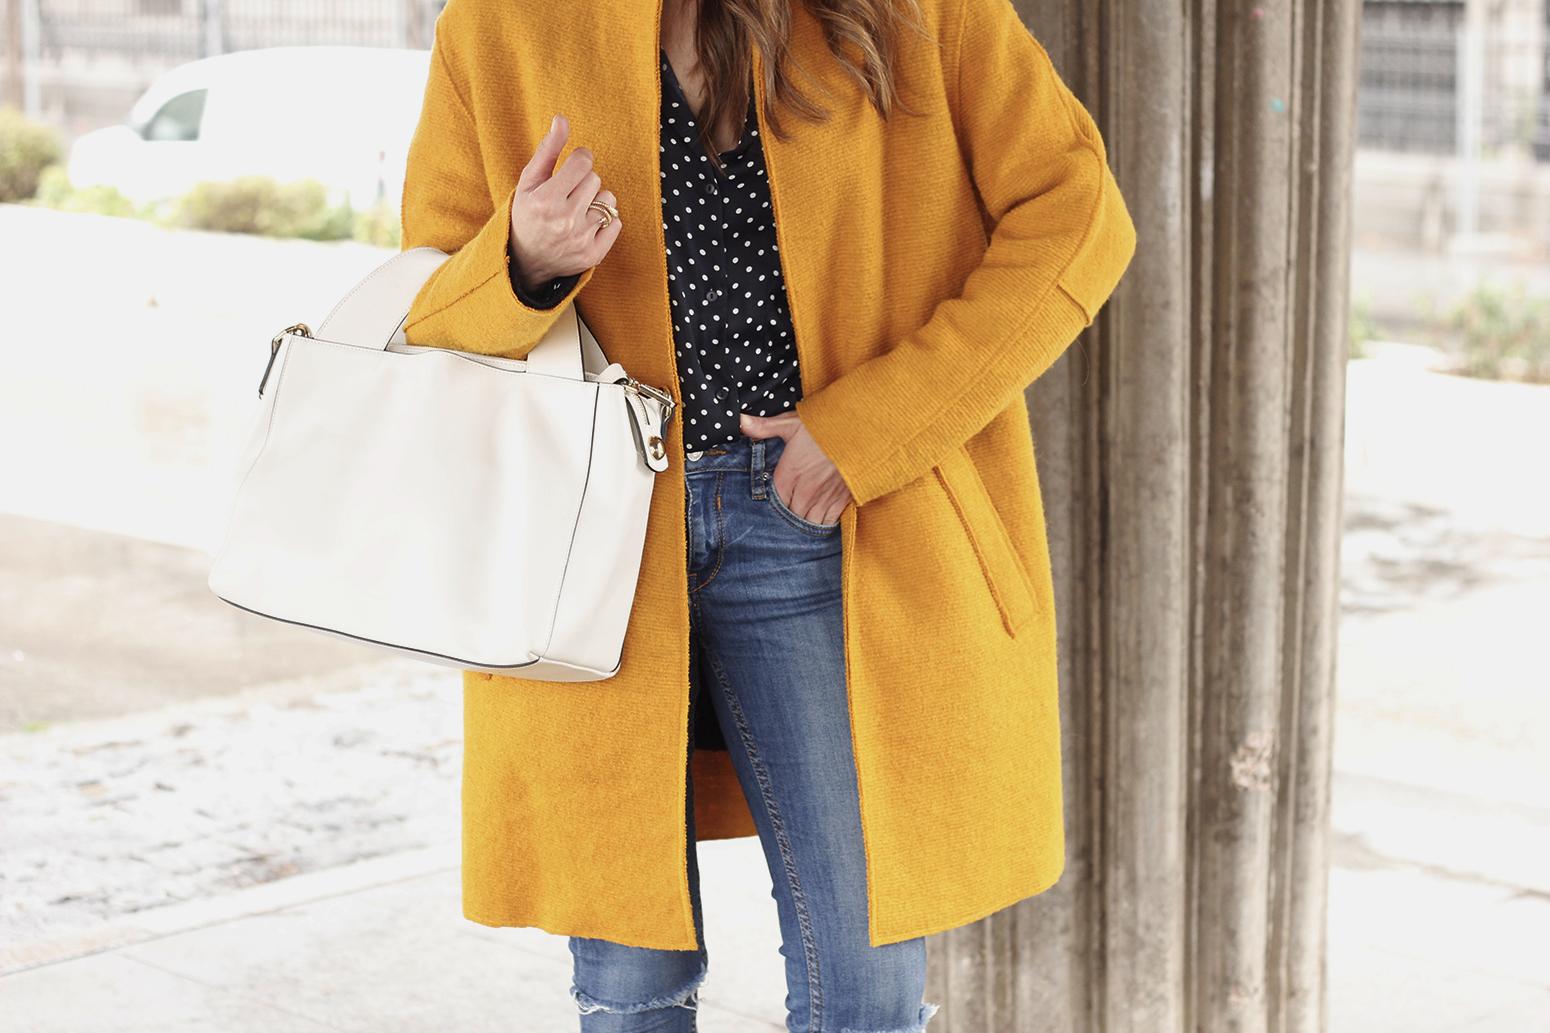 mustard coat polka dots shirt leopard heels white bag outfit 11